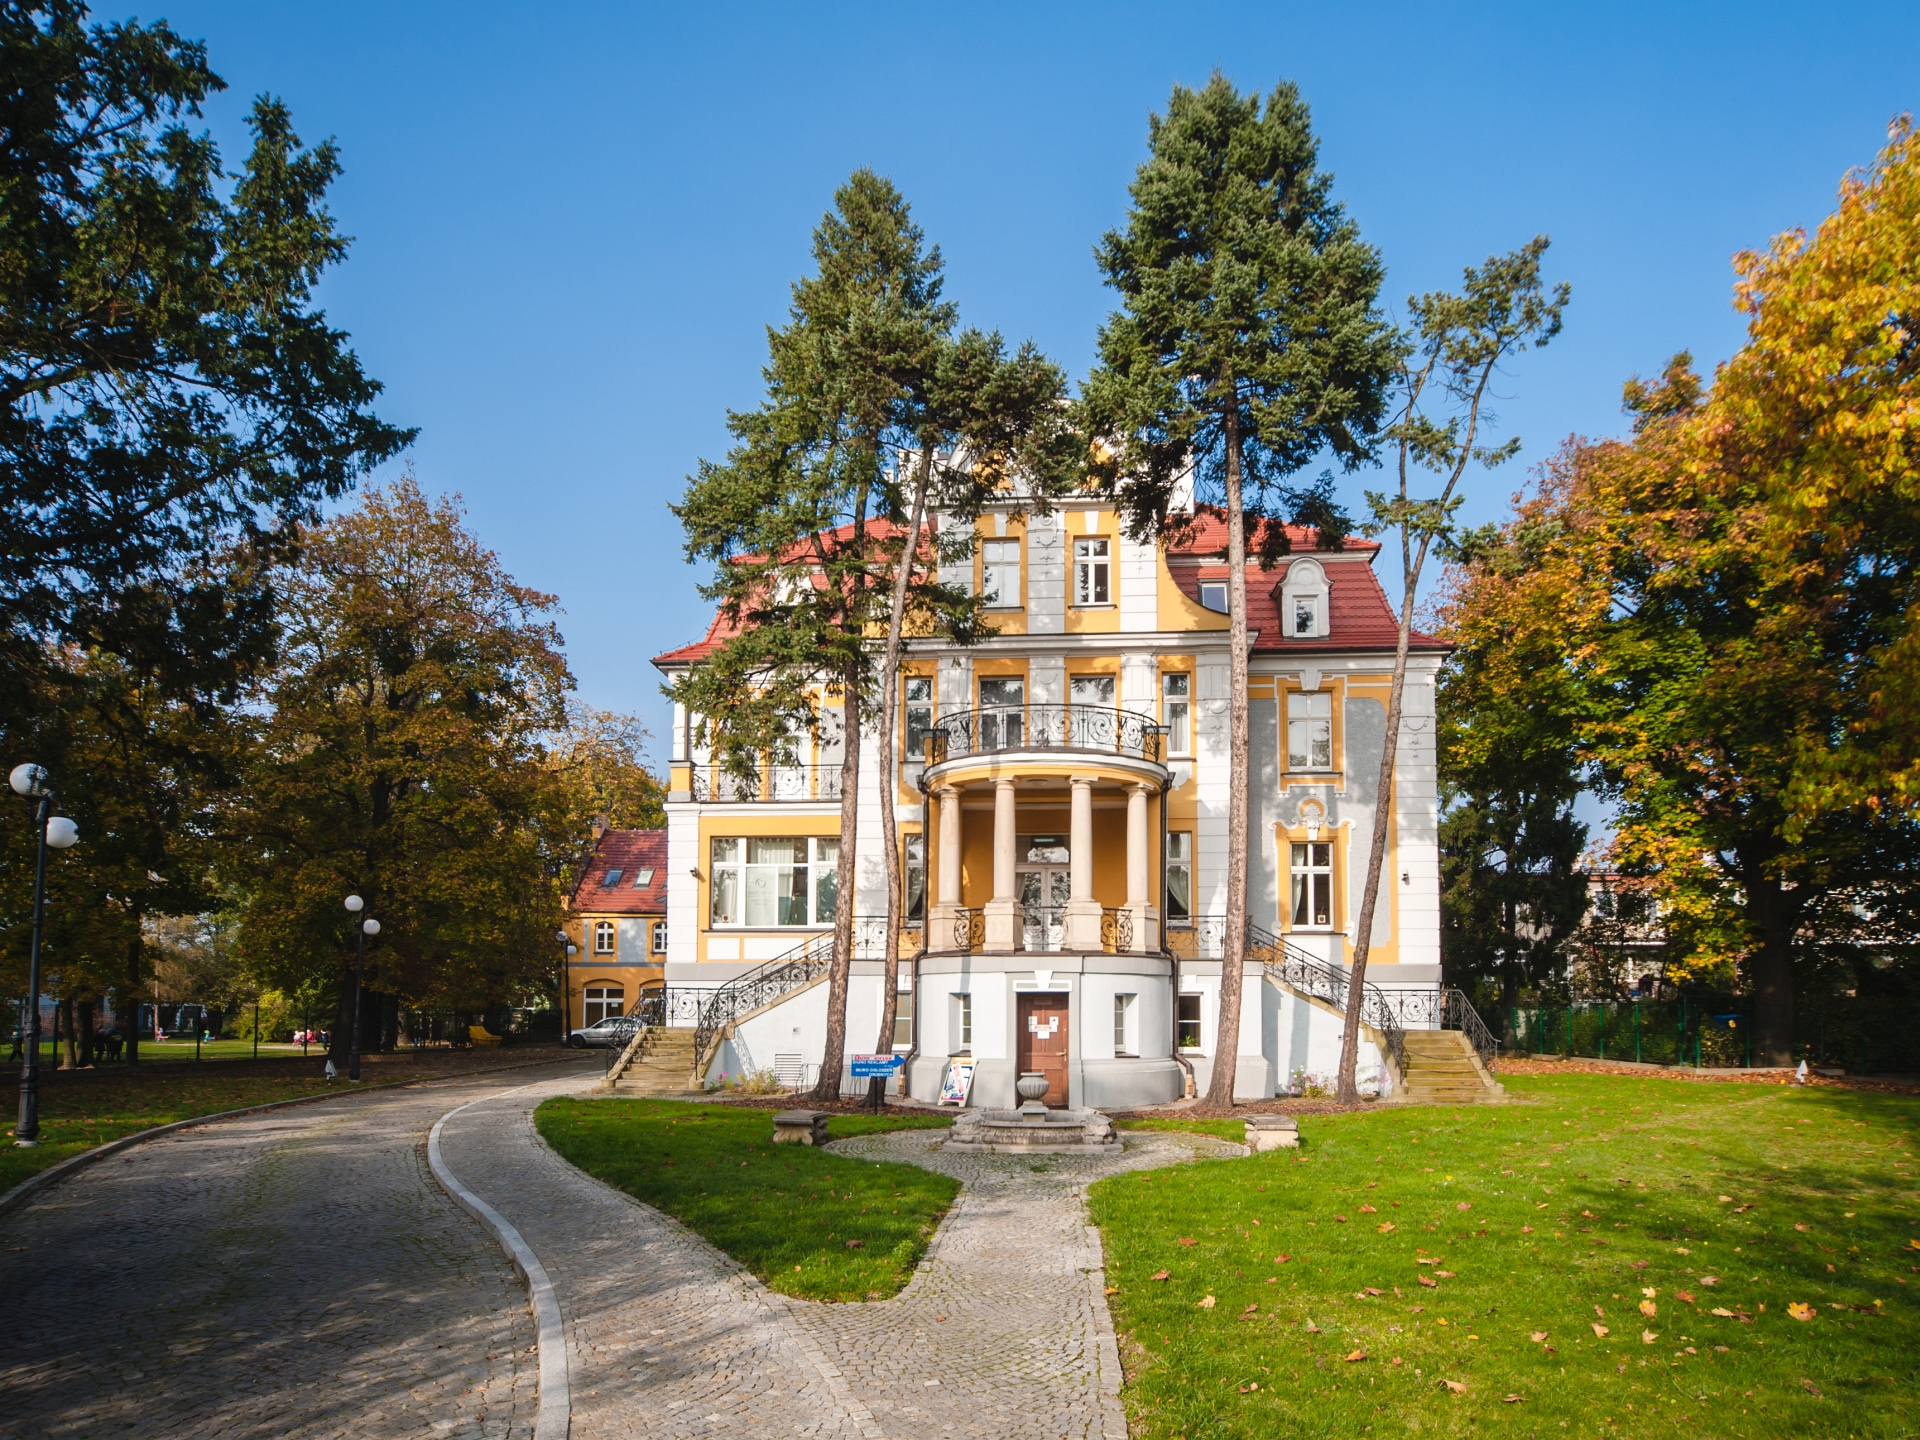 Vivienda unifamiliar por un Venta en Wrocław - Kasprowicza Wroclaw, Lower Silesian, Polonia